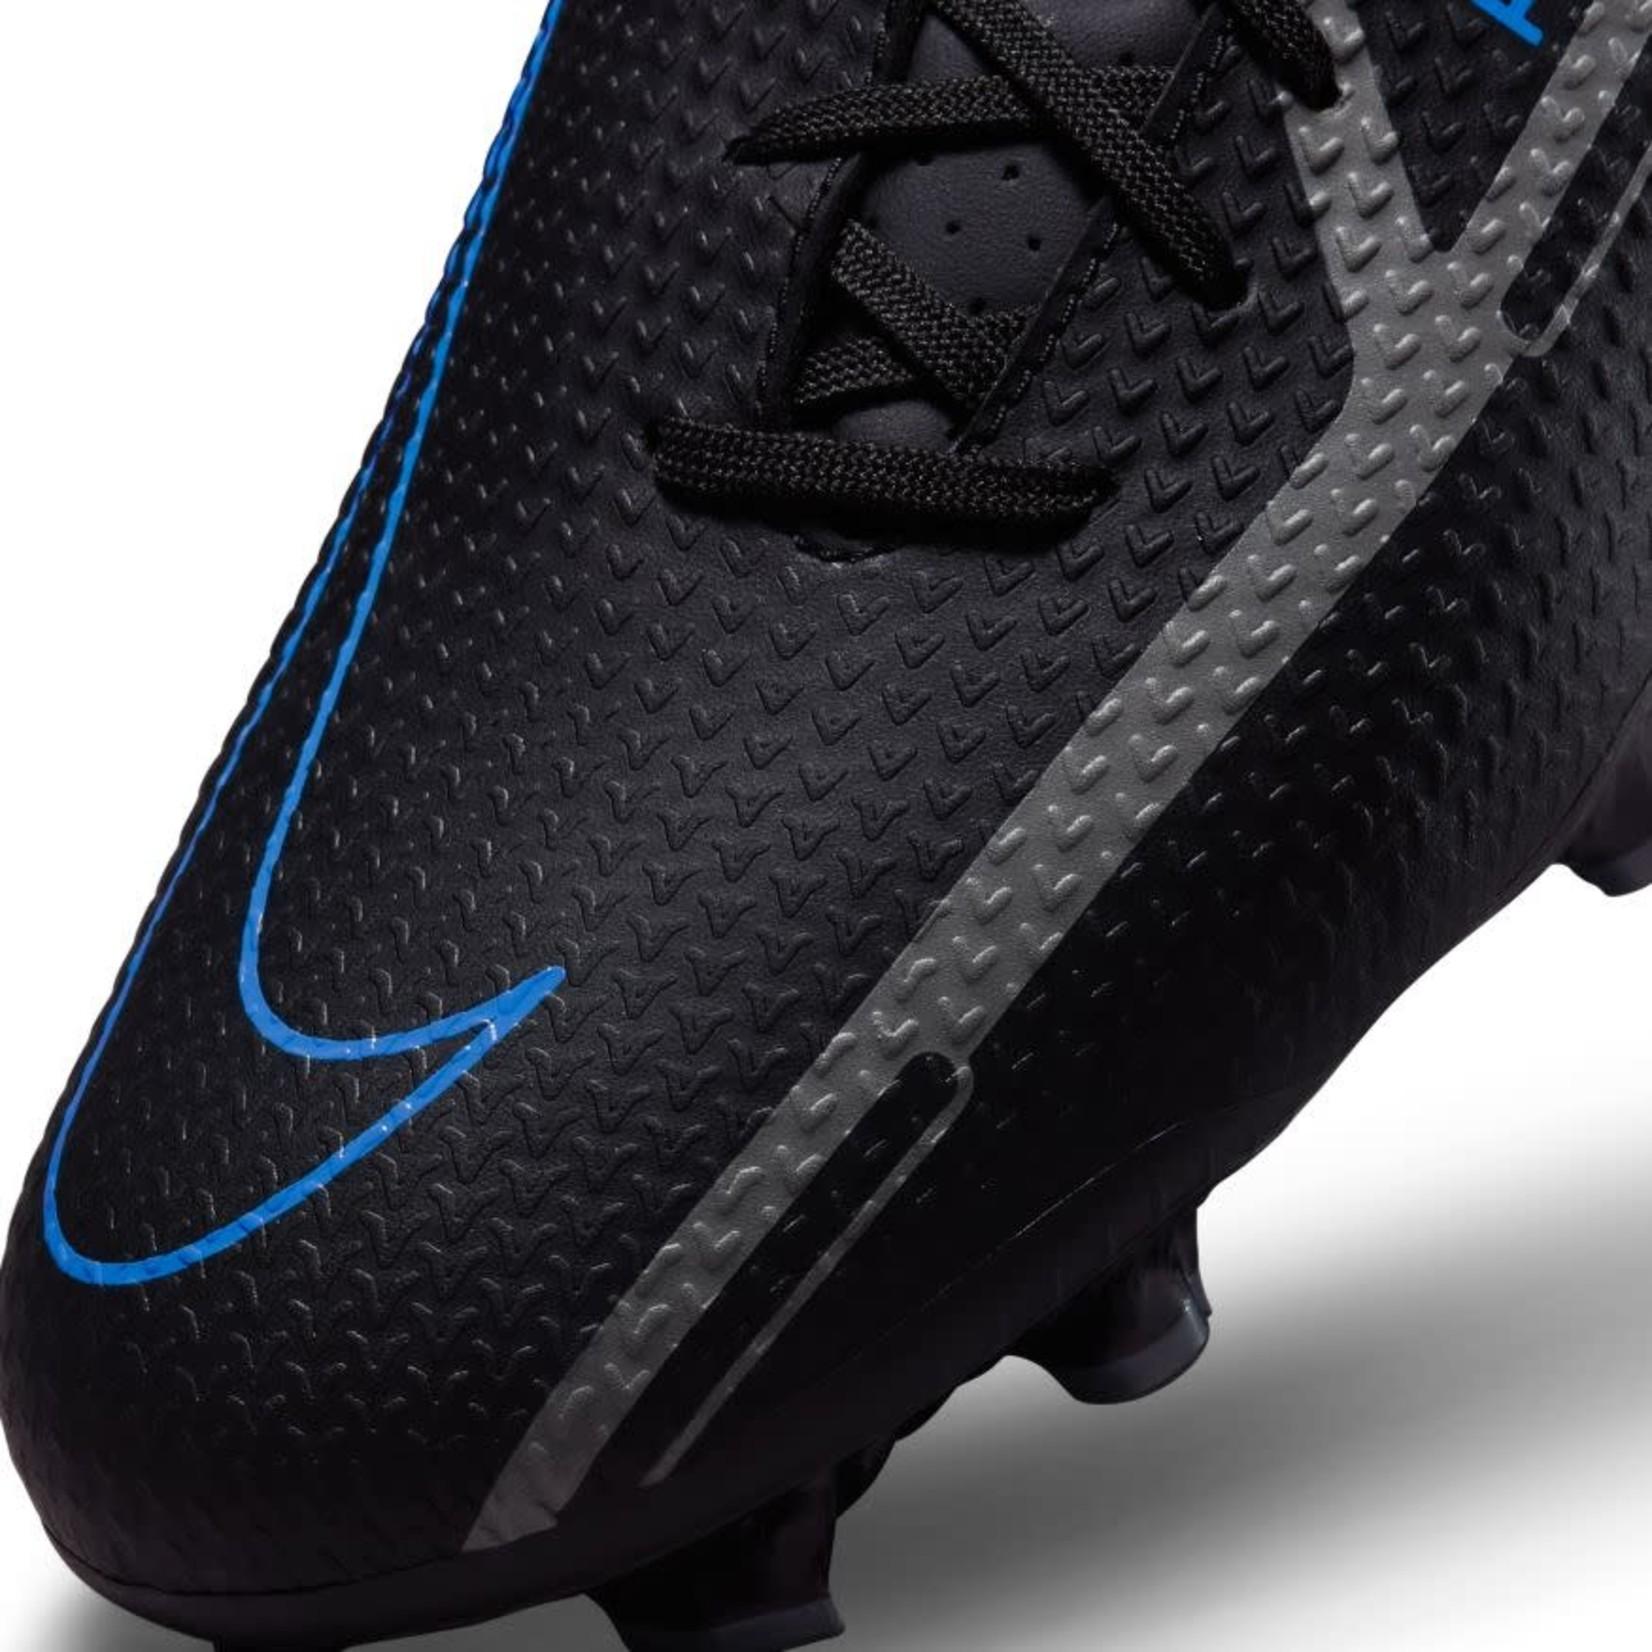 NIKE PHANTOM GT2 ACADEMY FG/MG (BLACK/BLUE)